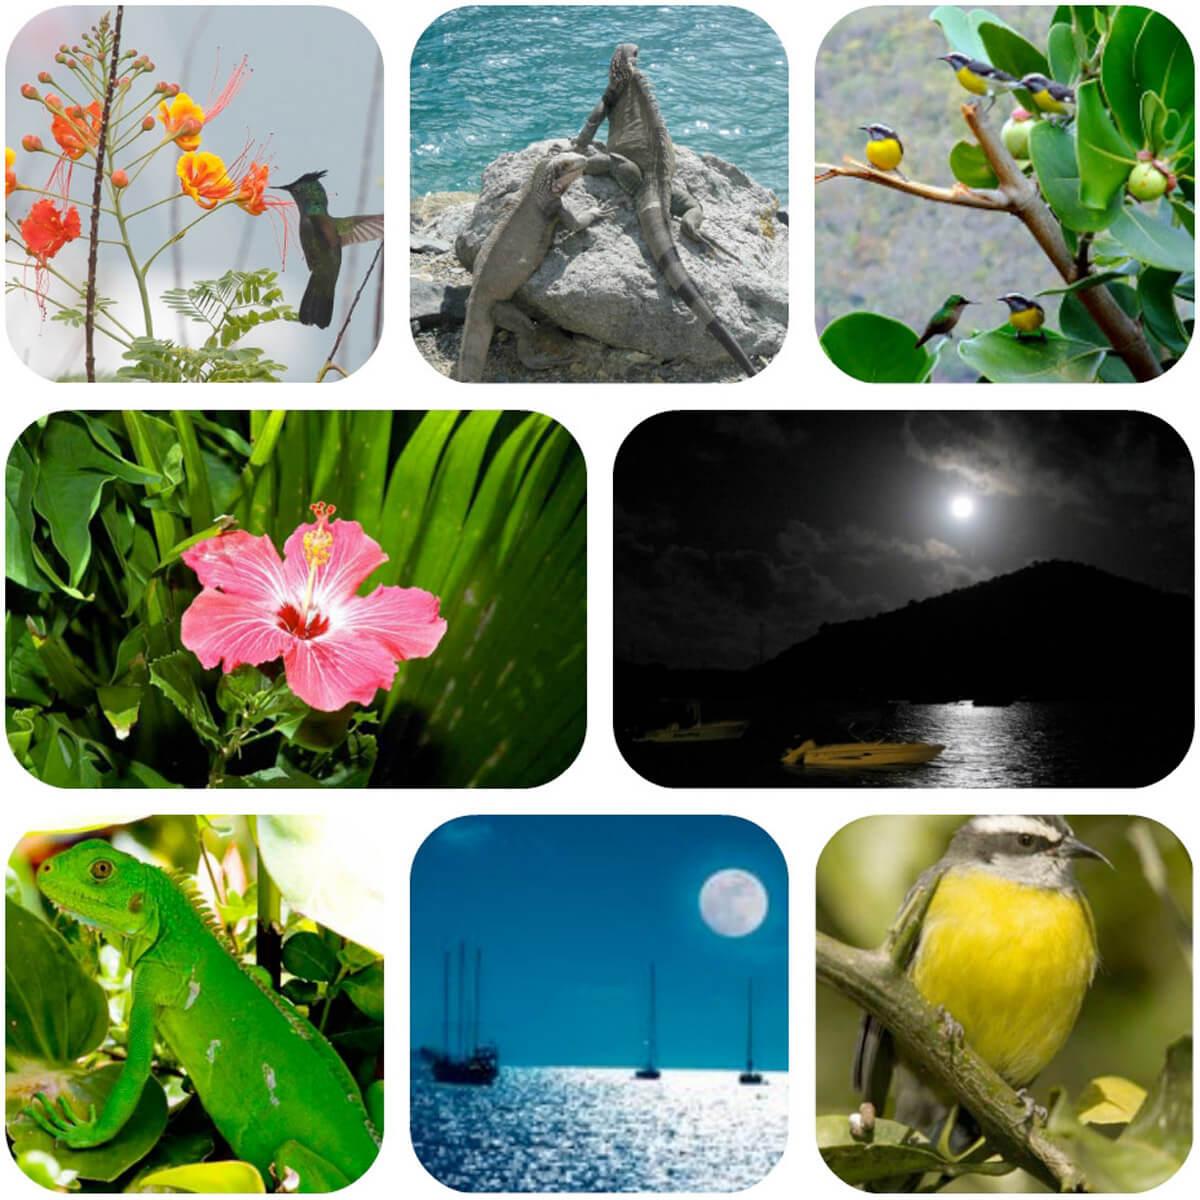 The Natural Beauty of Coral Bay St John